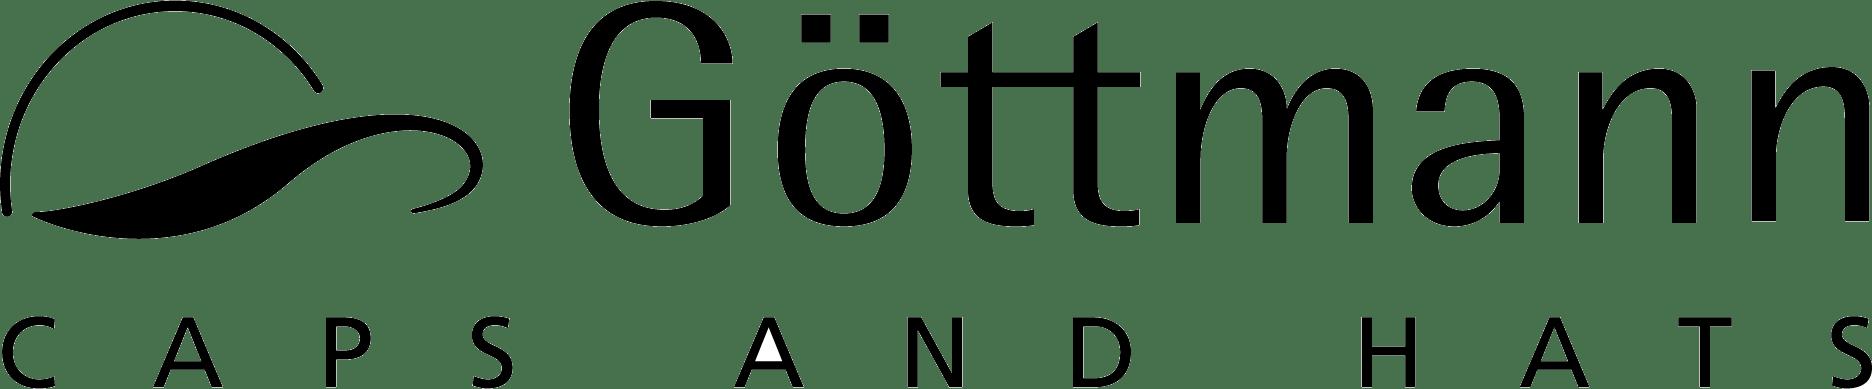 Göttmann Caps